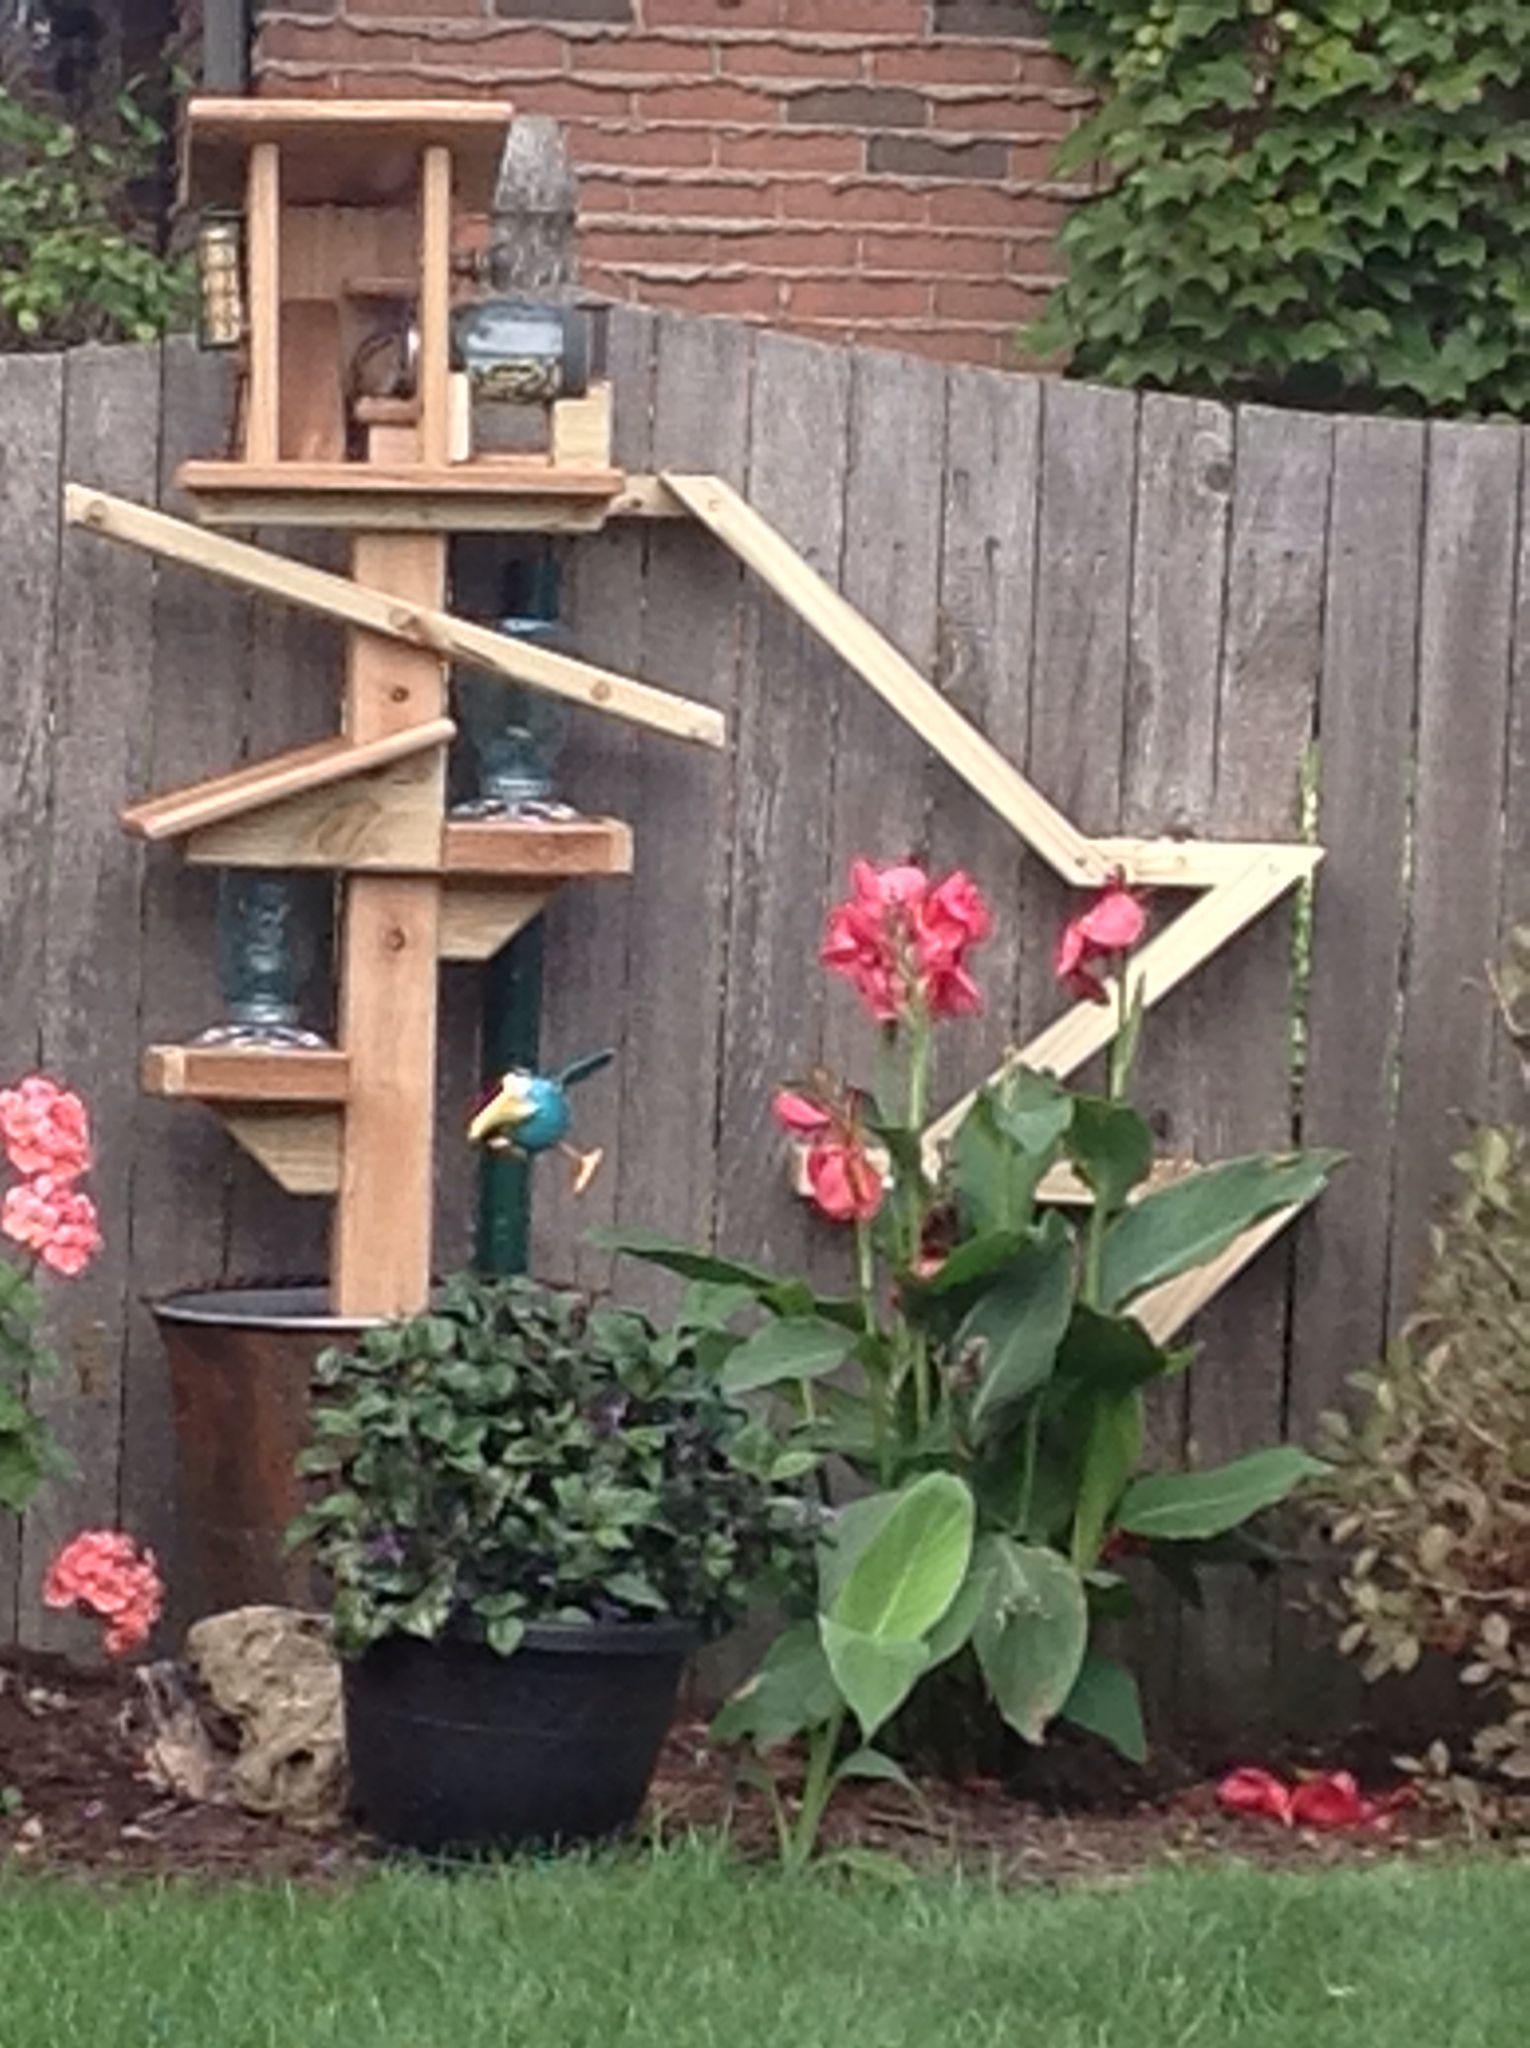 Chipmunk bird feeder backyard diy projects garden